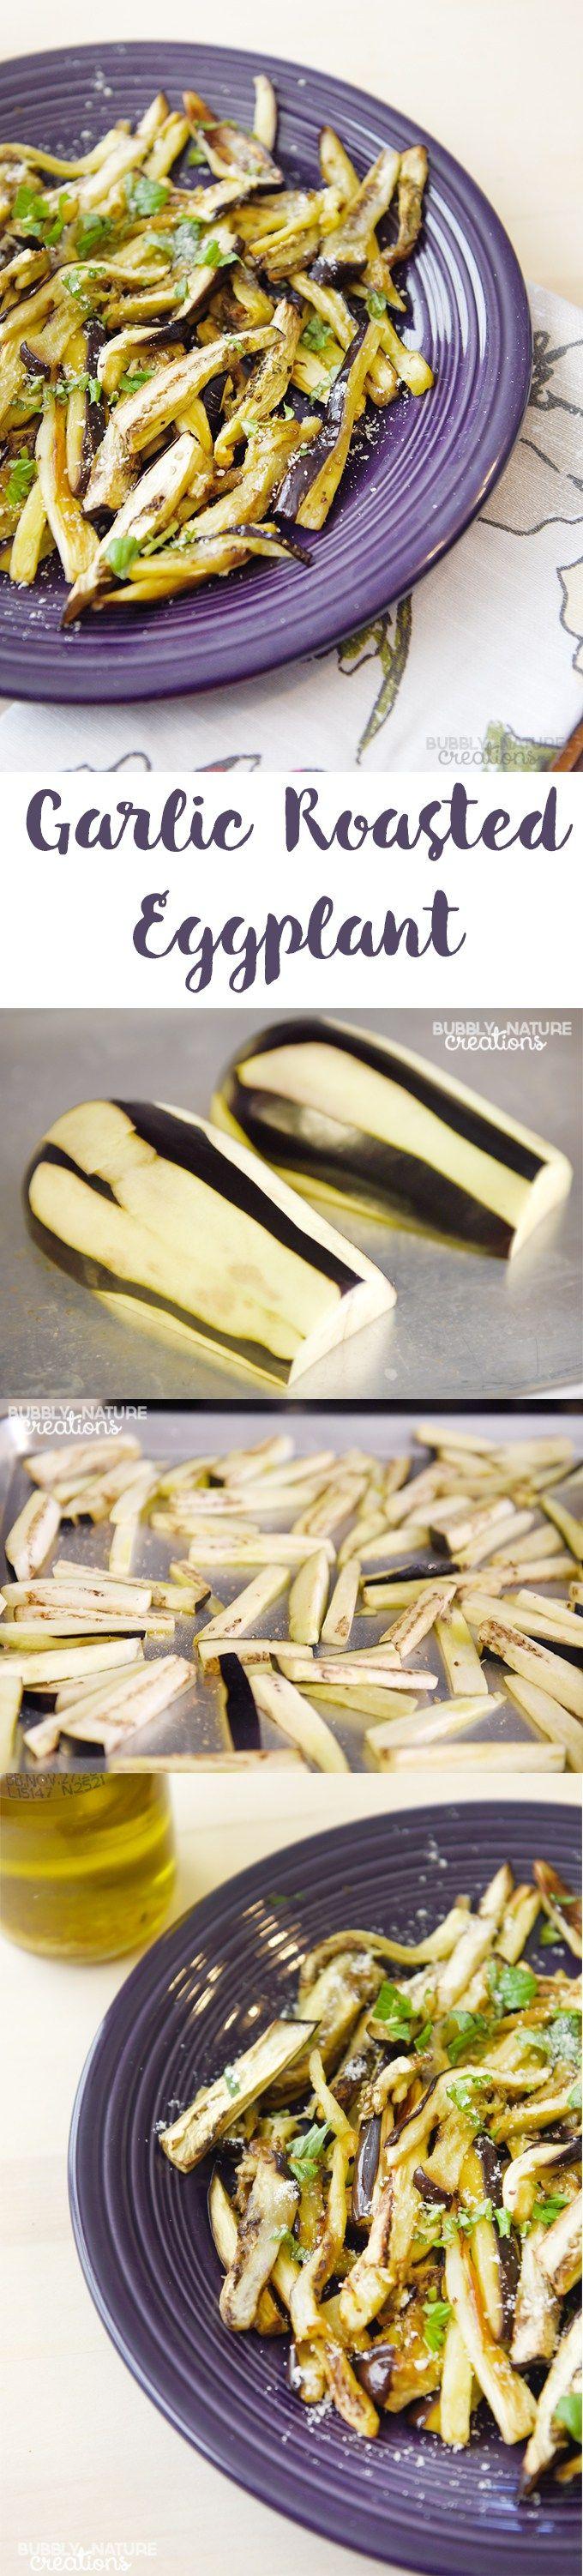 Garlic Roasted Eggplant - Sprinkle Some Fun